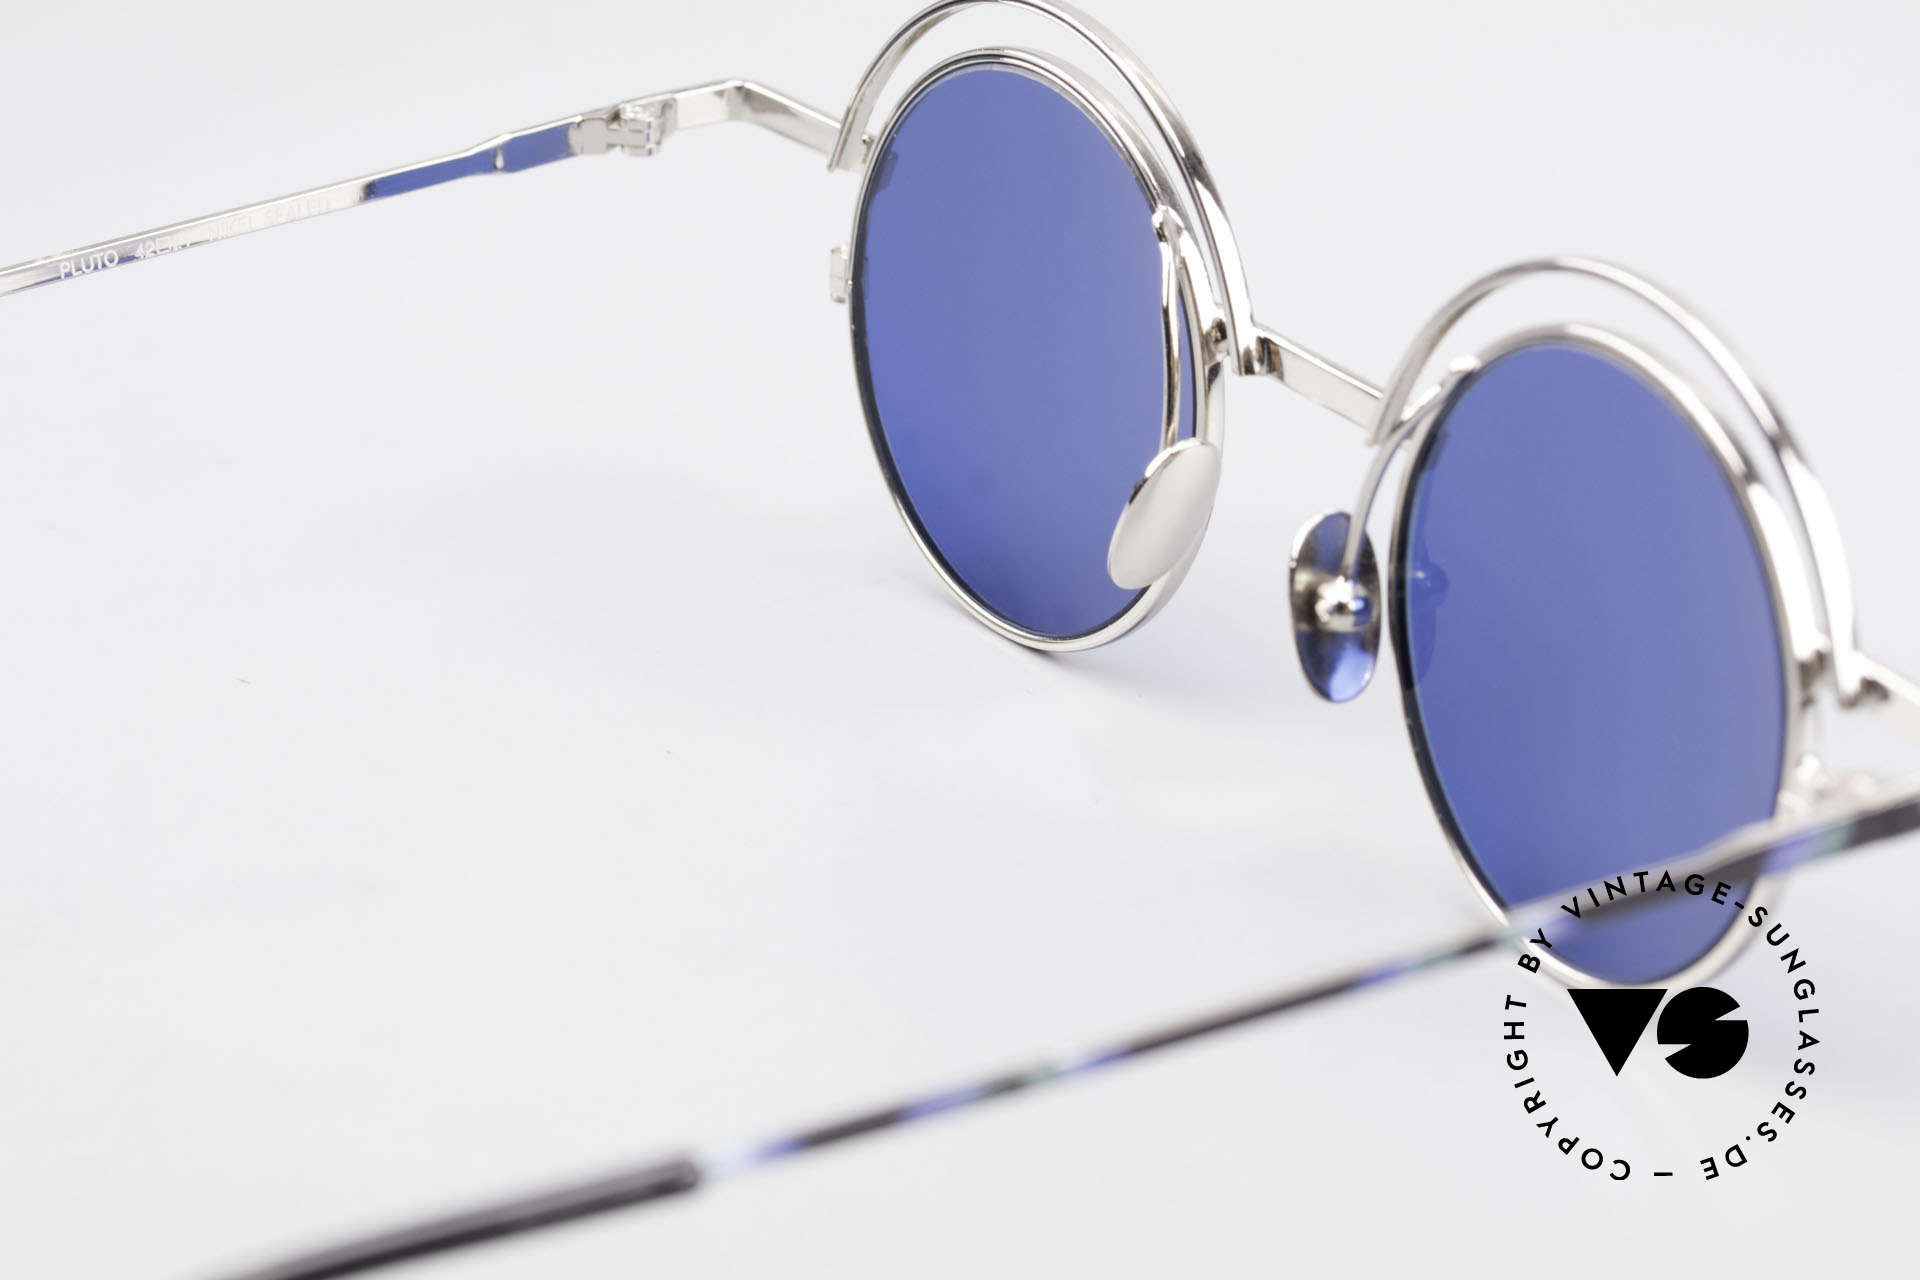 IMAGO Pluto Art Designer Sunglasses 90's, sun lenses (100% UV) can be replaced with prescriptions, Made for Men and Women